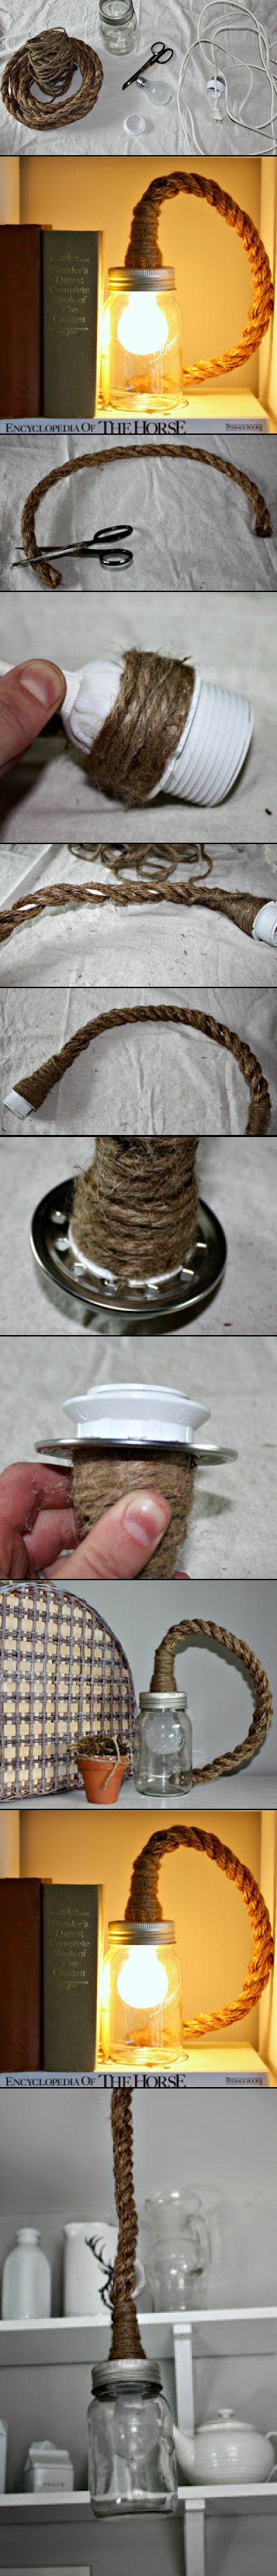 DIY Mason Jar Rope Light | #DIY #HOME #Decor